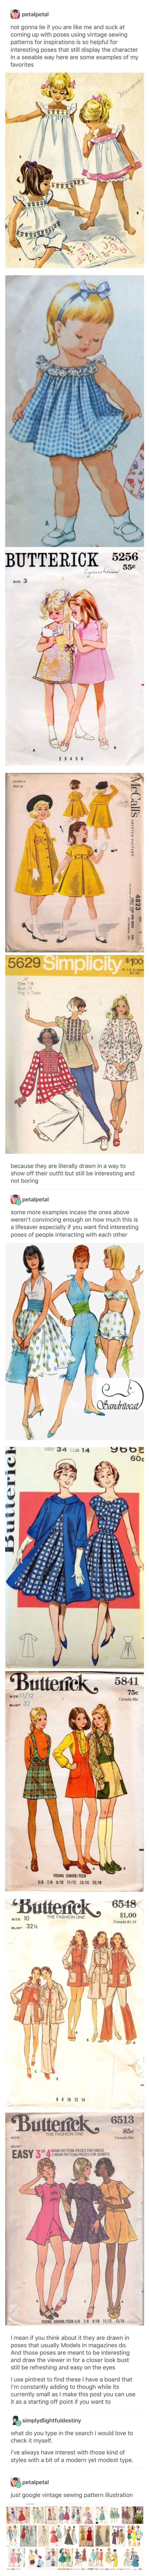 Vintage sewing pattern poses